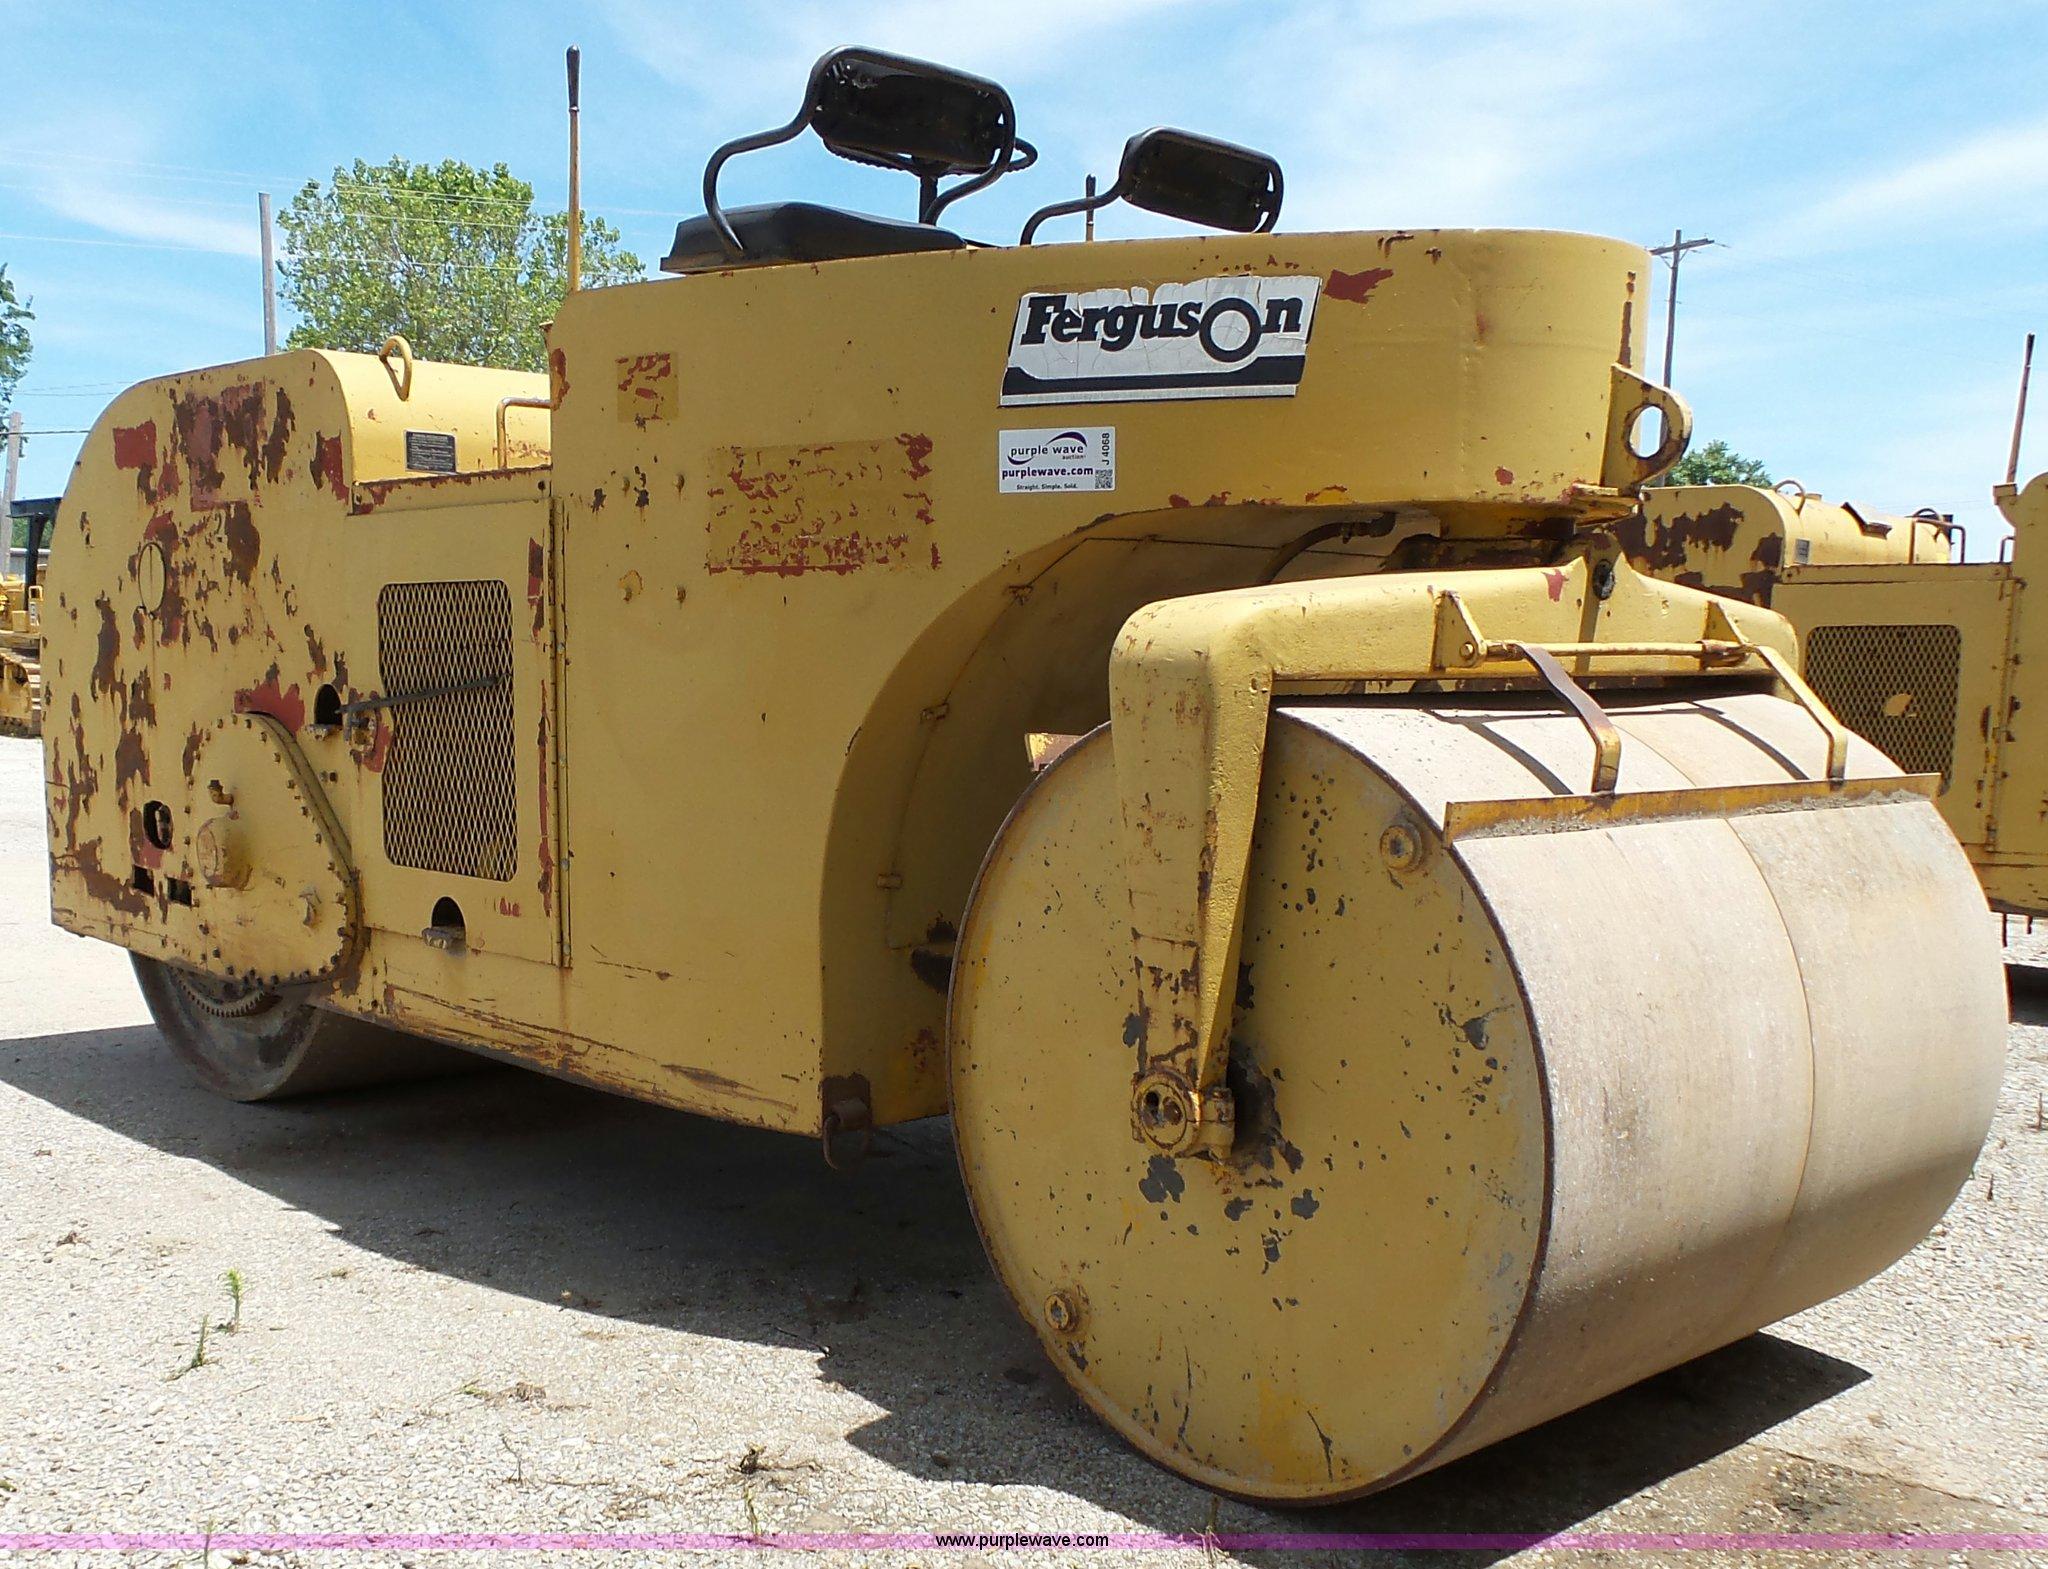 Ferguson 8-12 smooth double drum roller | Item J4068 | SOLD!...